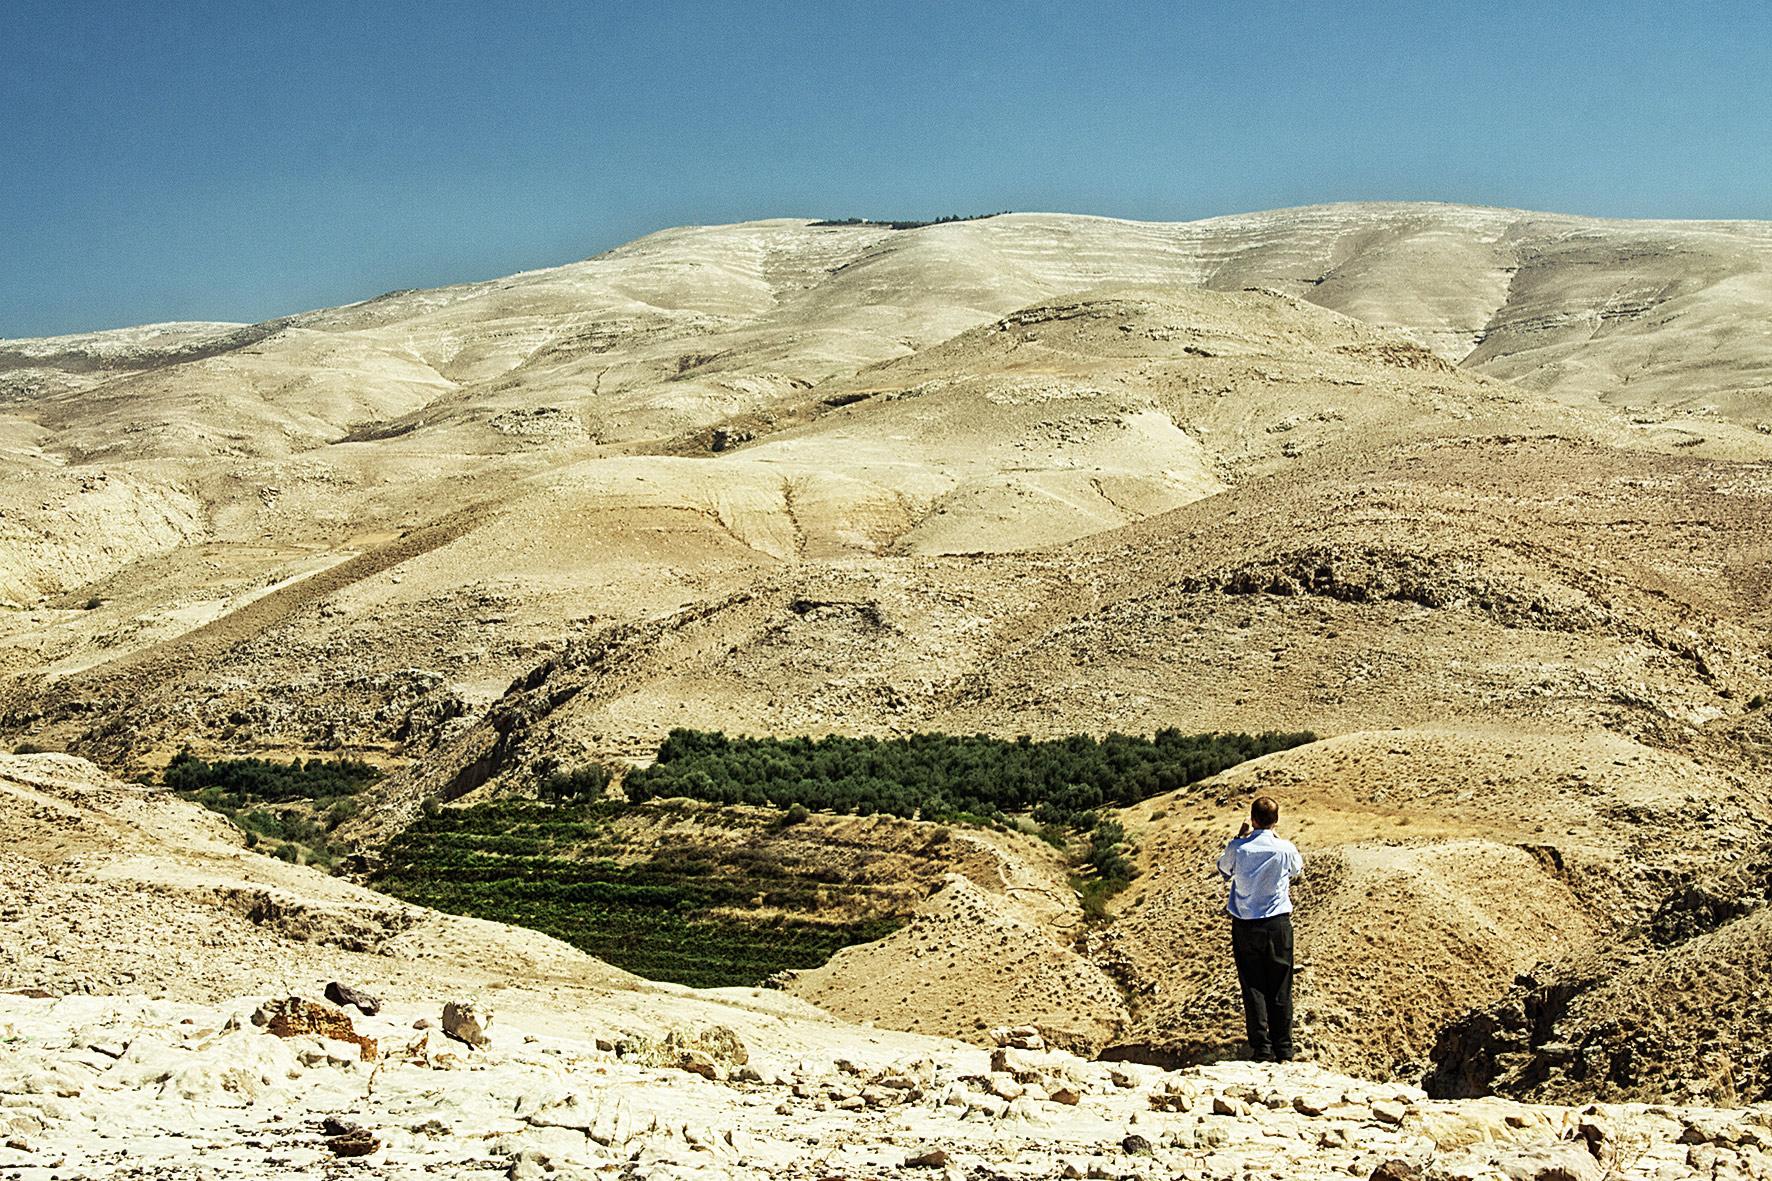 Jordanie, Vallée des Rois. 2010